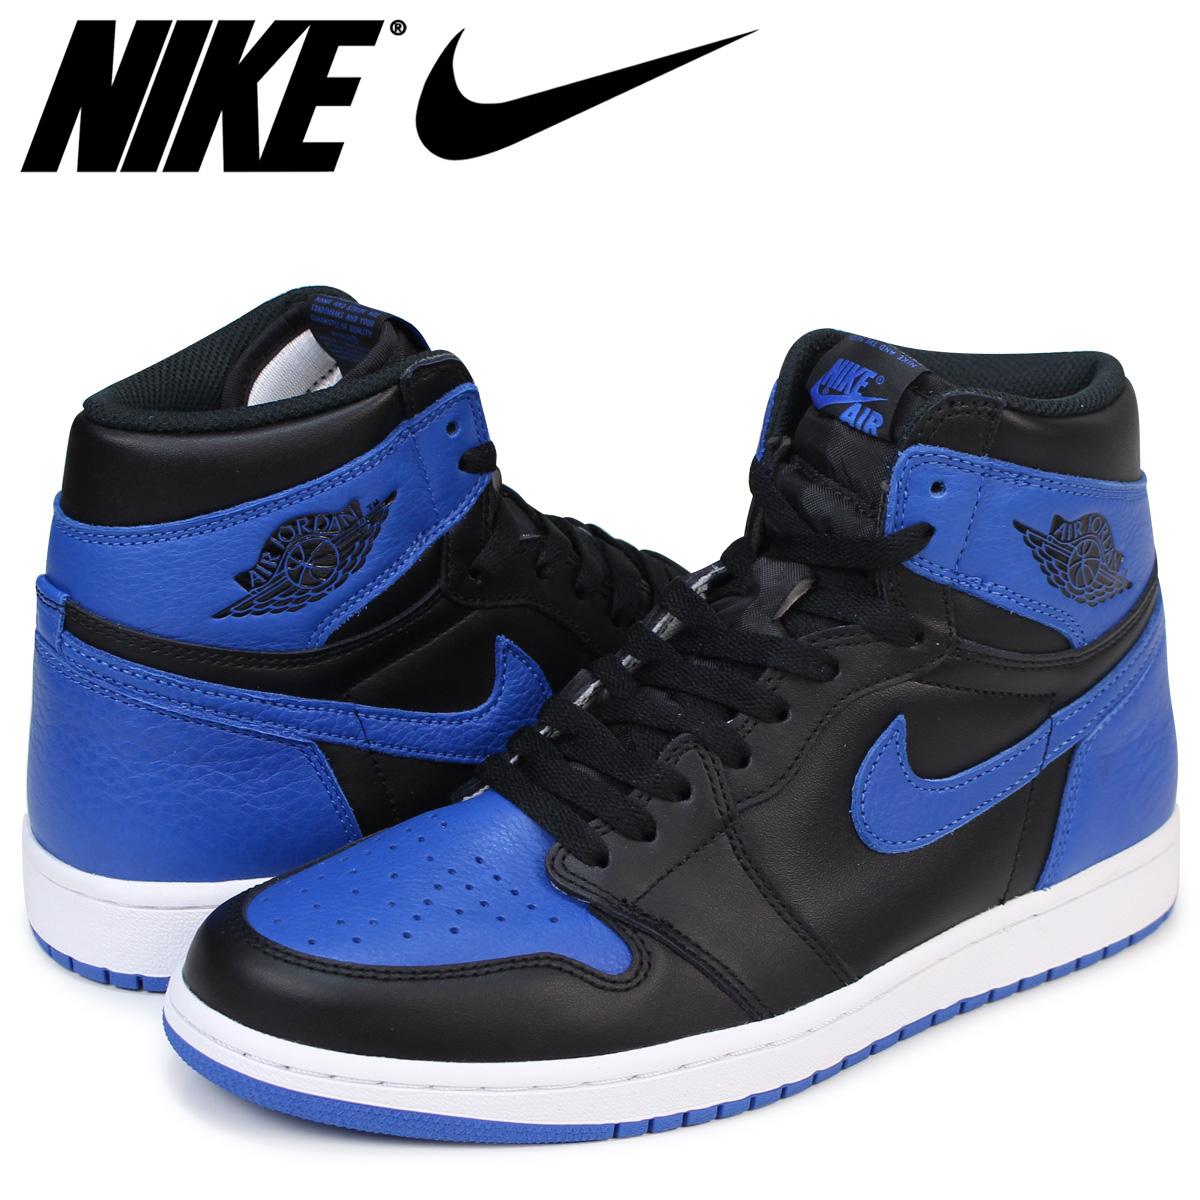 new lifestyle detailed pictures new arrival Nike NIKE Air Jordan 1 nostalgic sneakers AIR JORDAN 1 RETRO HIGH OG ROYAL  555,088-007 men's royal black